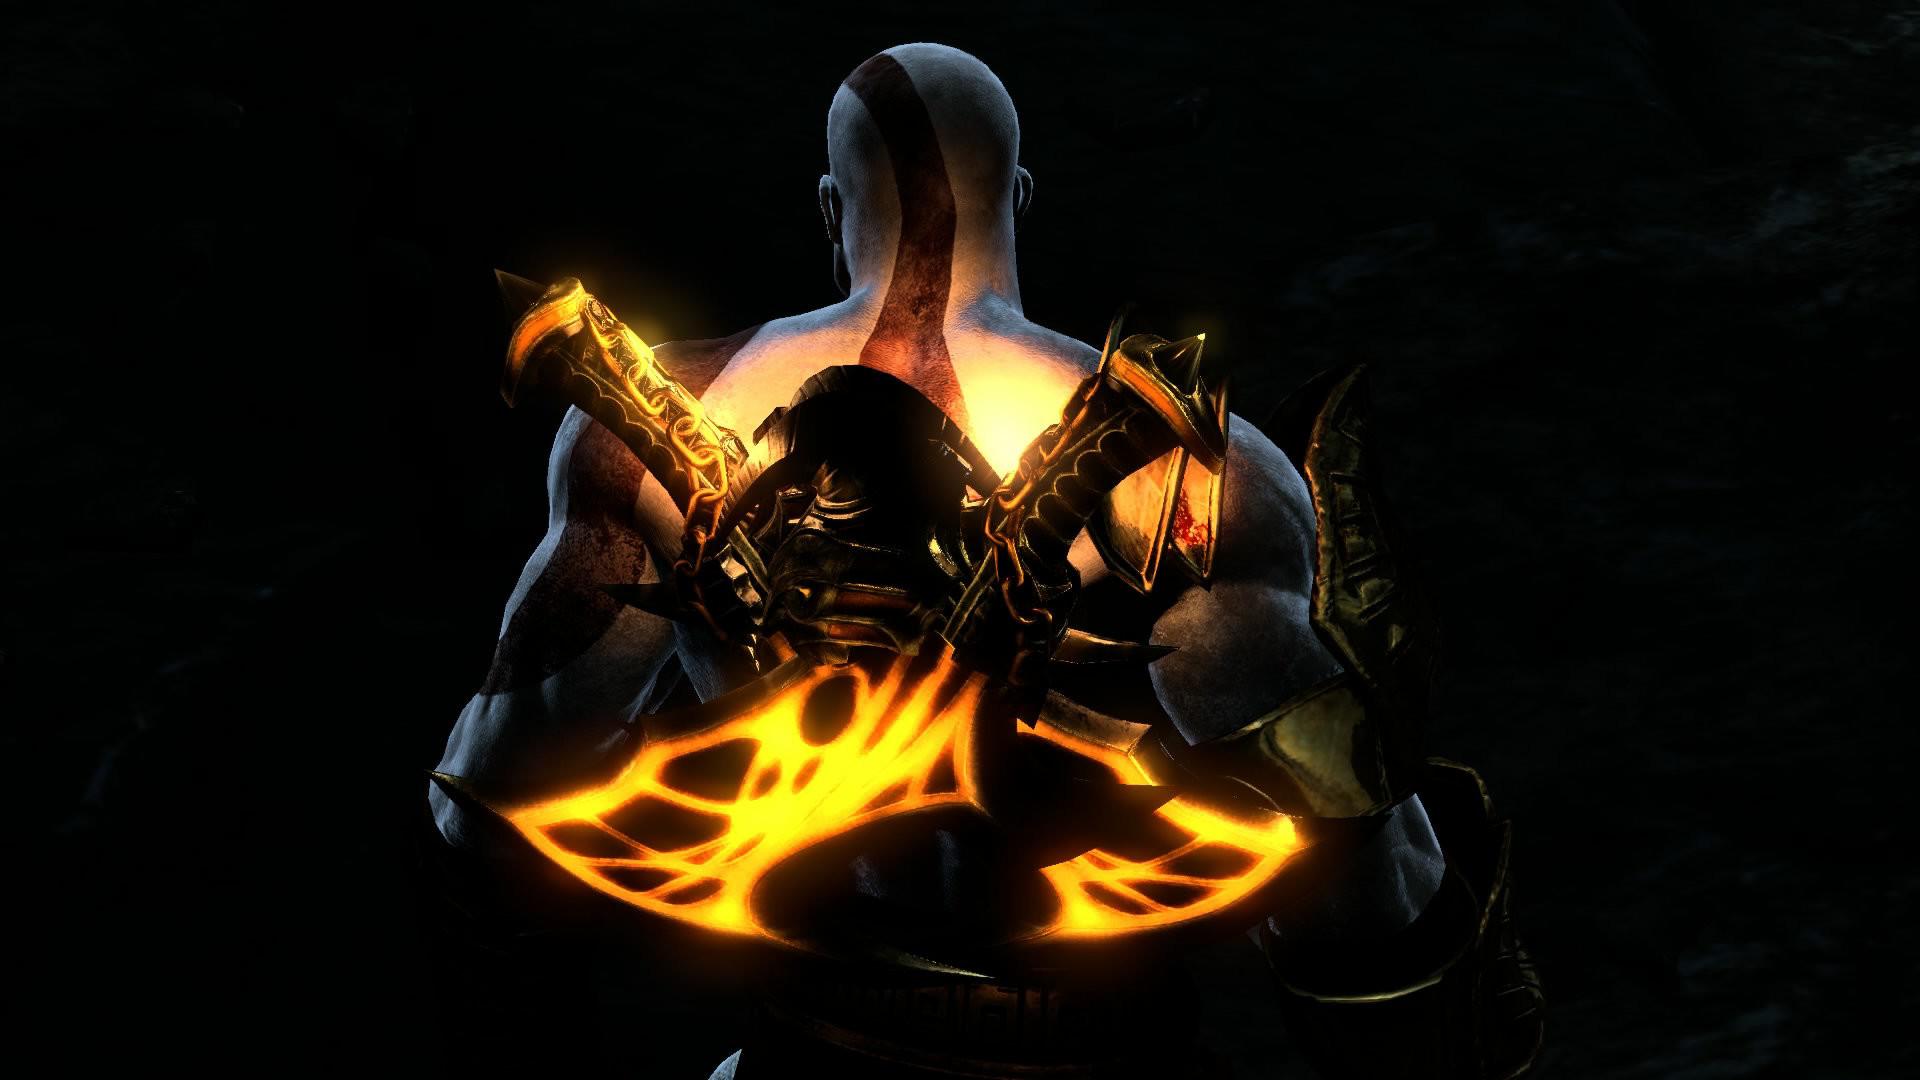 God Of War 3 Remastered Screen 11 Ps4   Data Src Free - Gambar God Of War 3 Hd - HD Wallpaper